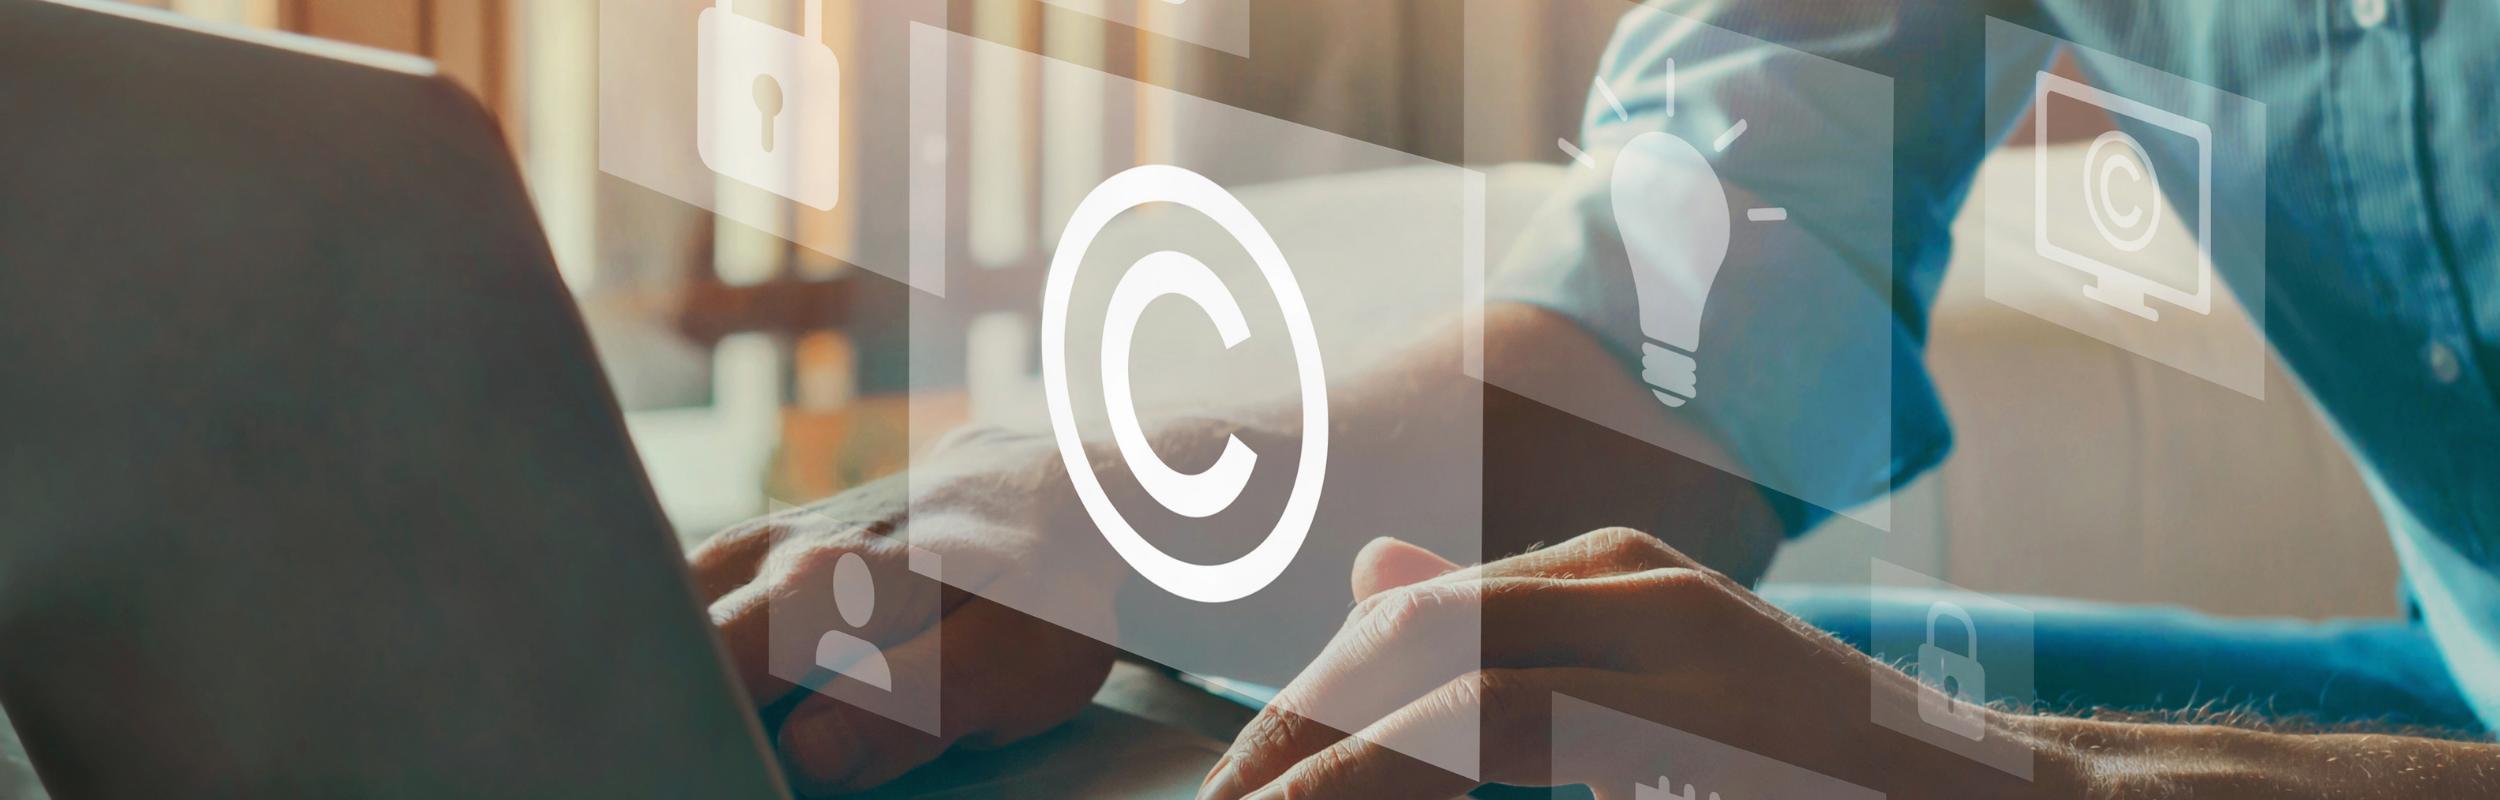 Copy of Avansic Case Study - civil litigation-4